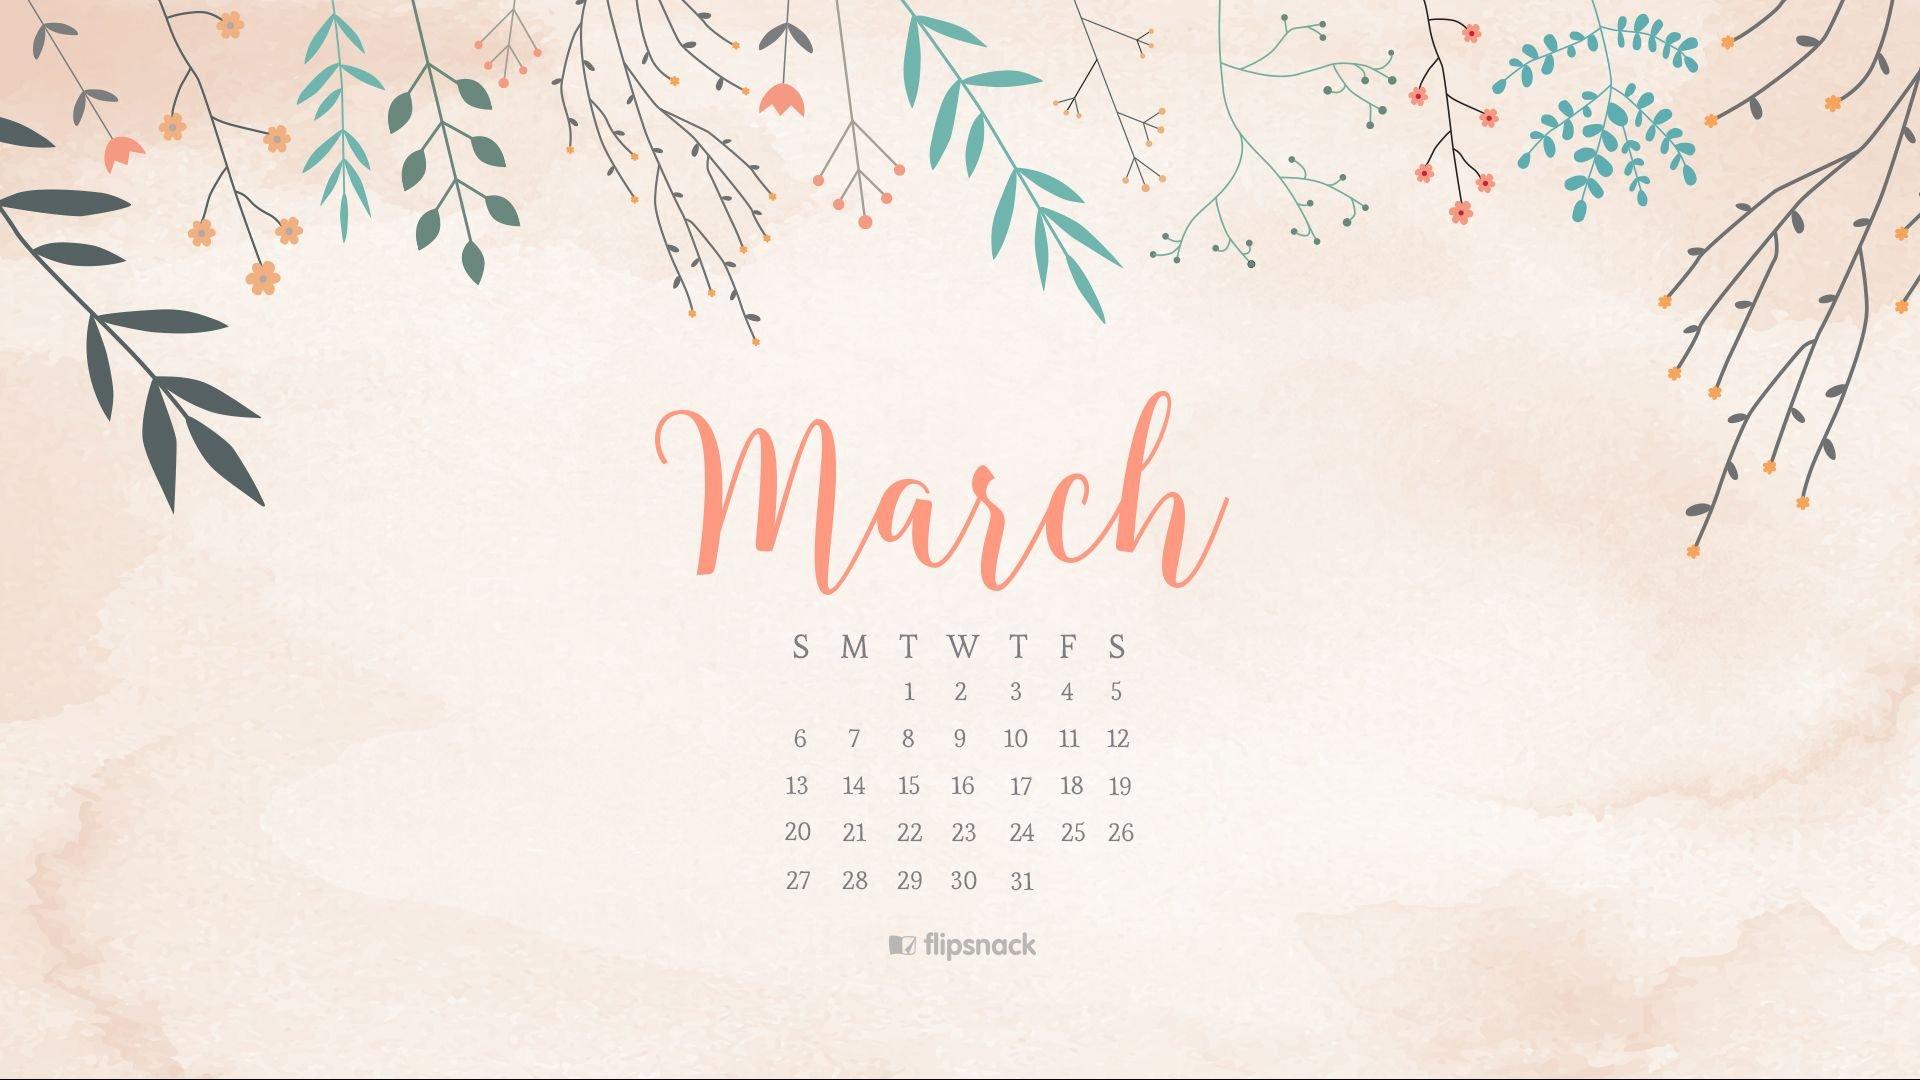 March 2016 Free Calendar Wallpaper – Desktop Background Download Crosscards Monthly Calendar For Computer Background